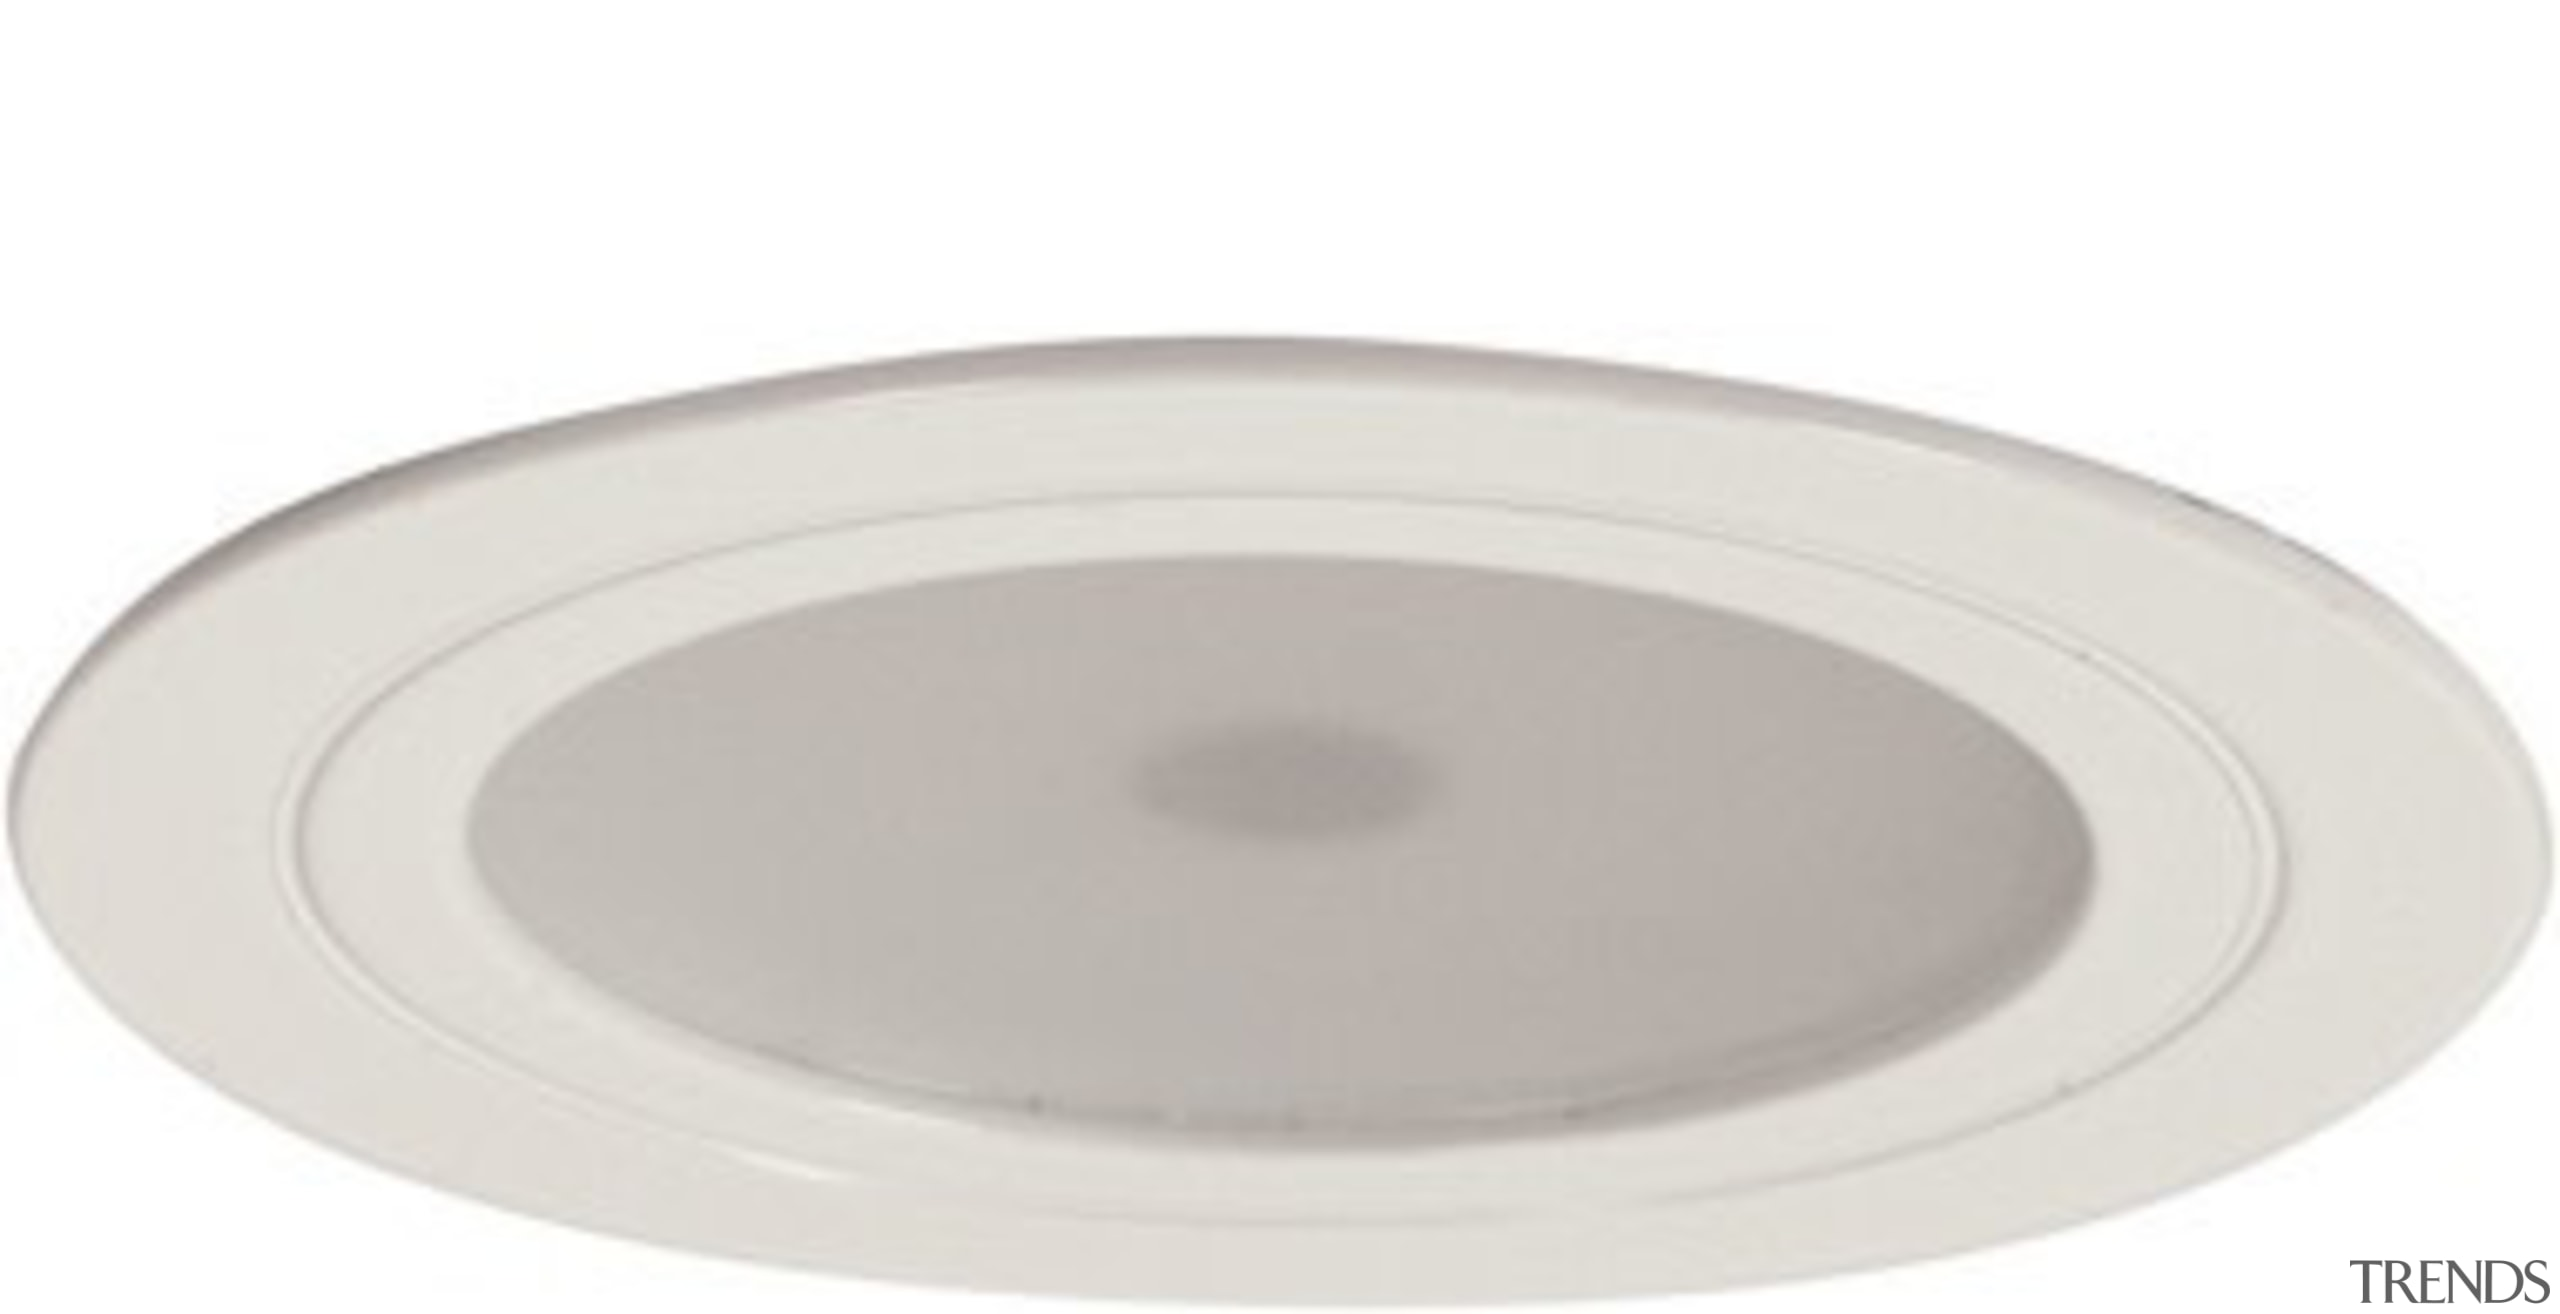 FeaturesA very sleek cabinet light designHigh quality long lighting, product design, white